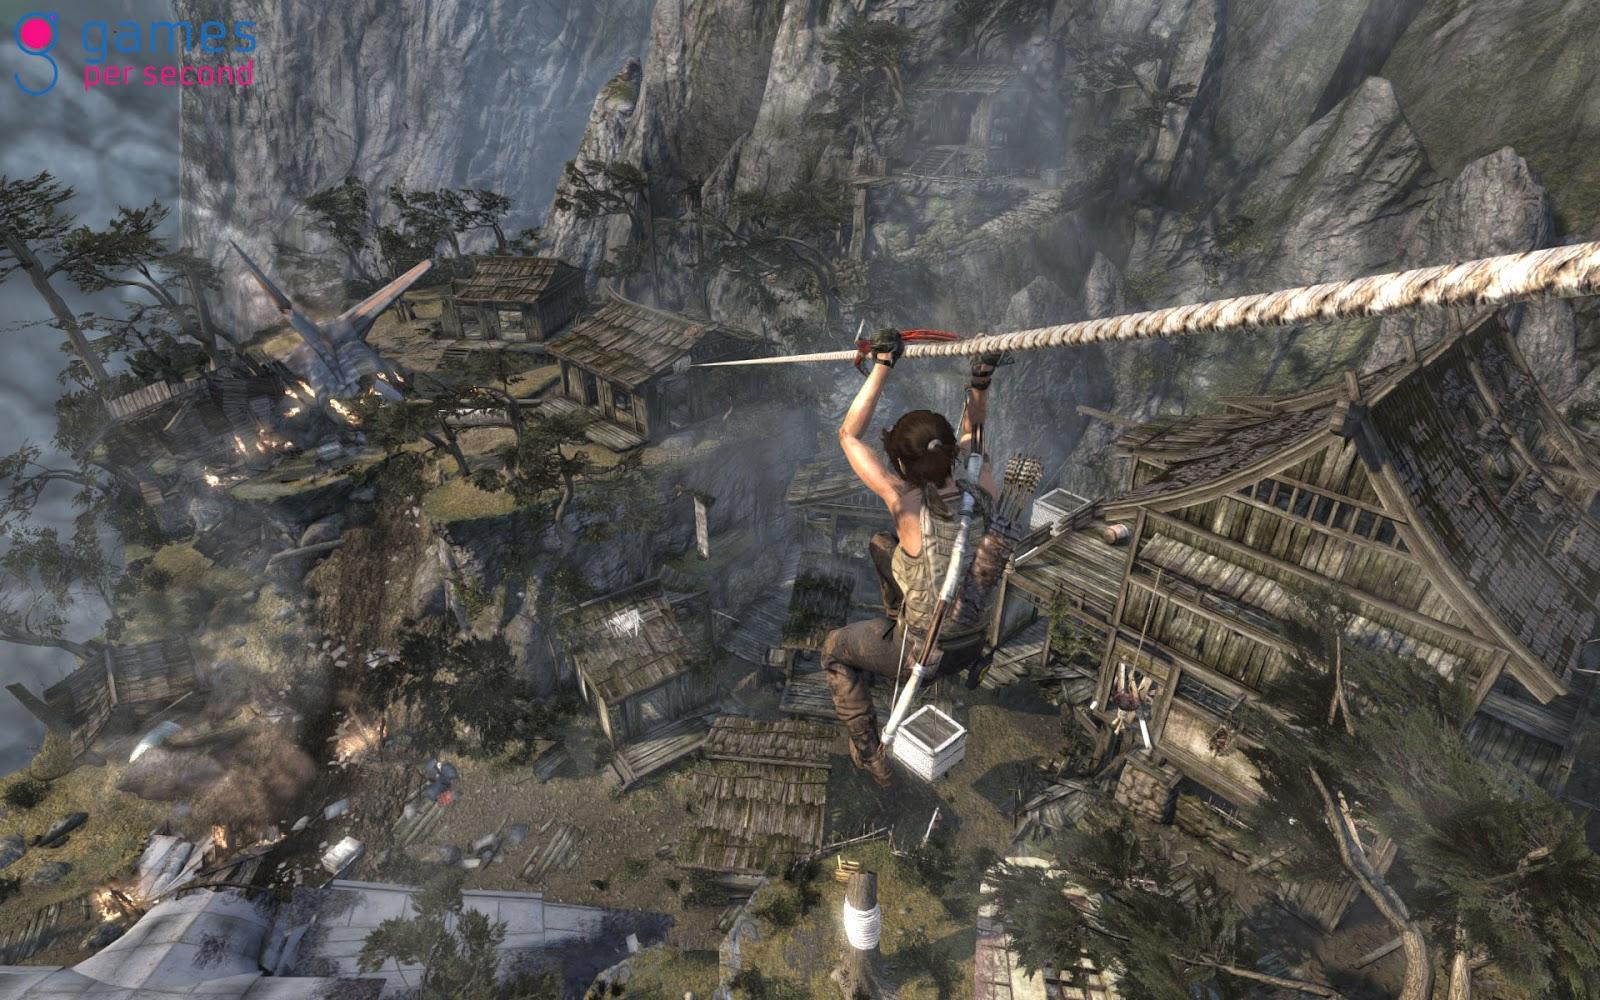 Download Tomb Raider 2013 PC Full Game - Download Games ...